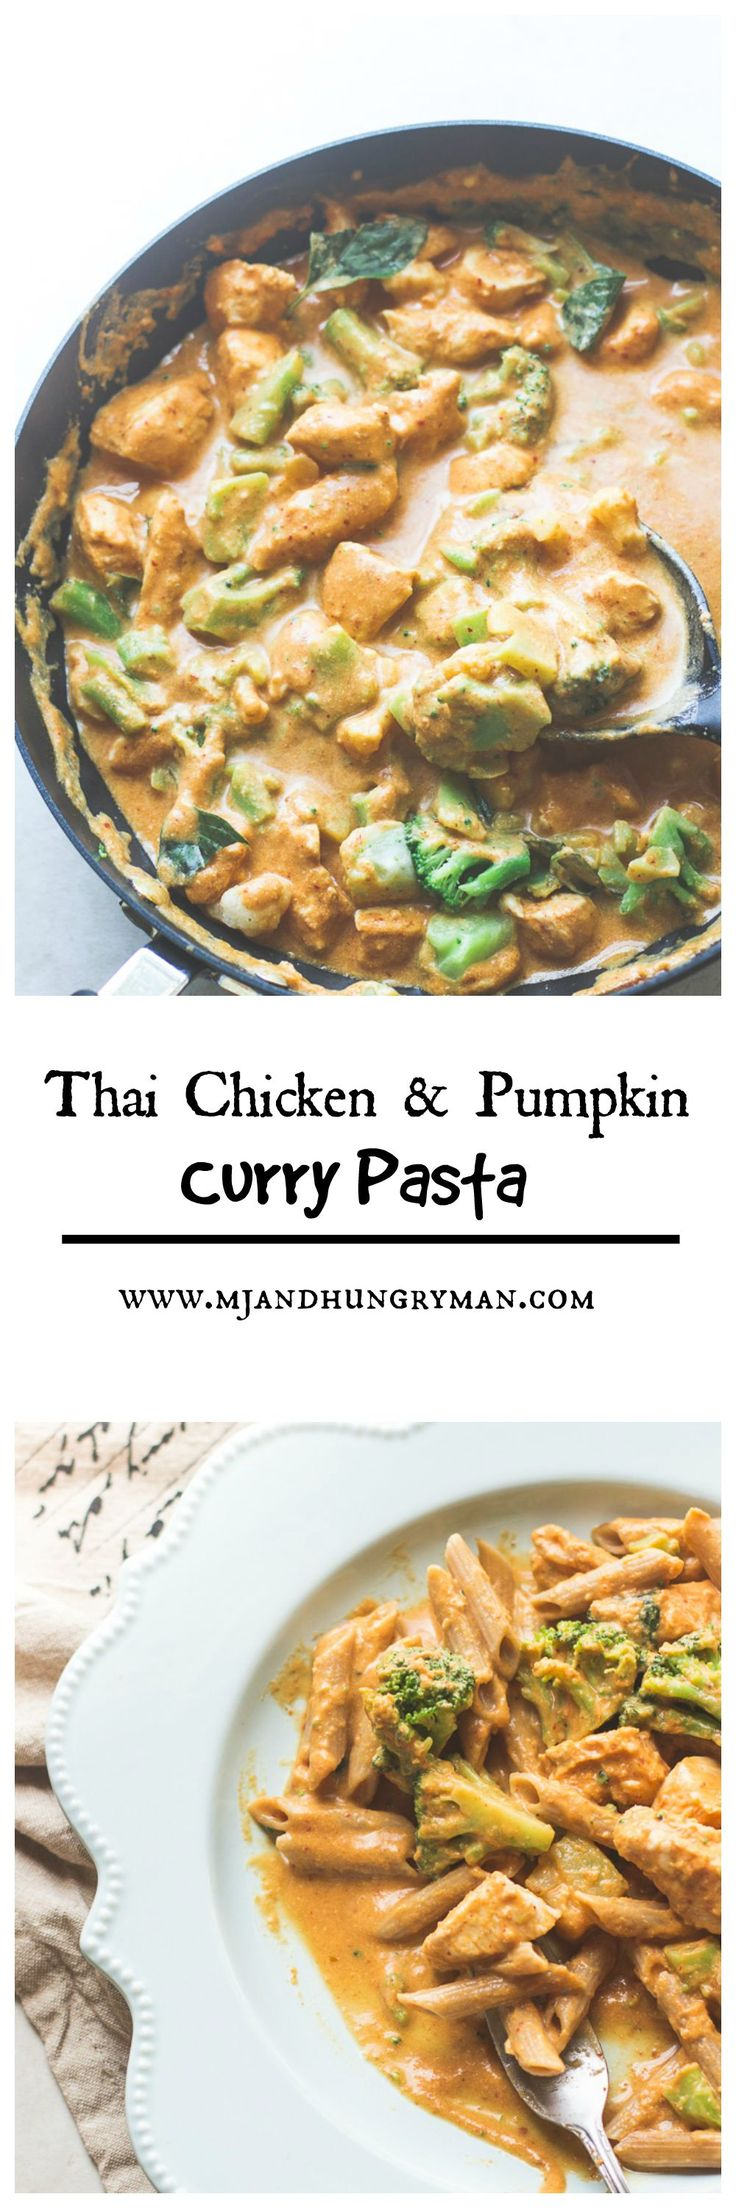 Thai Chicken and Pumpkin Curry Pasta  #pastafits #ad